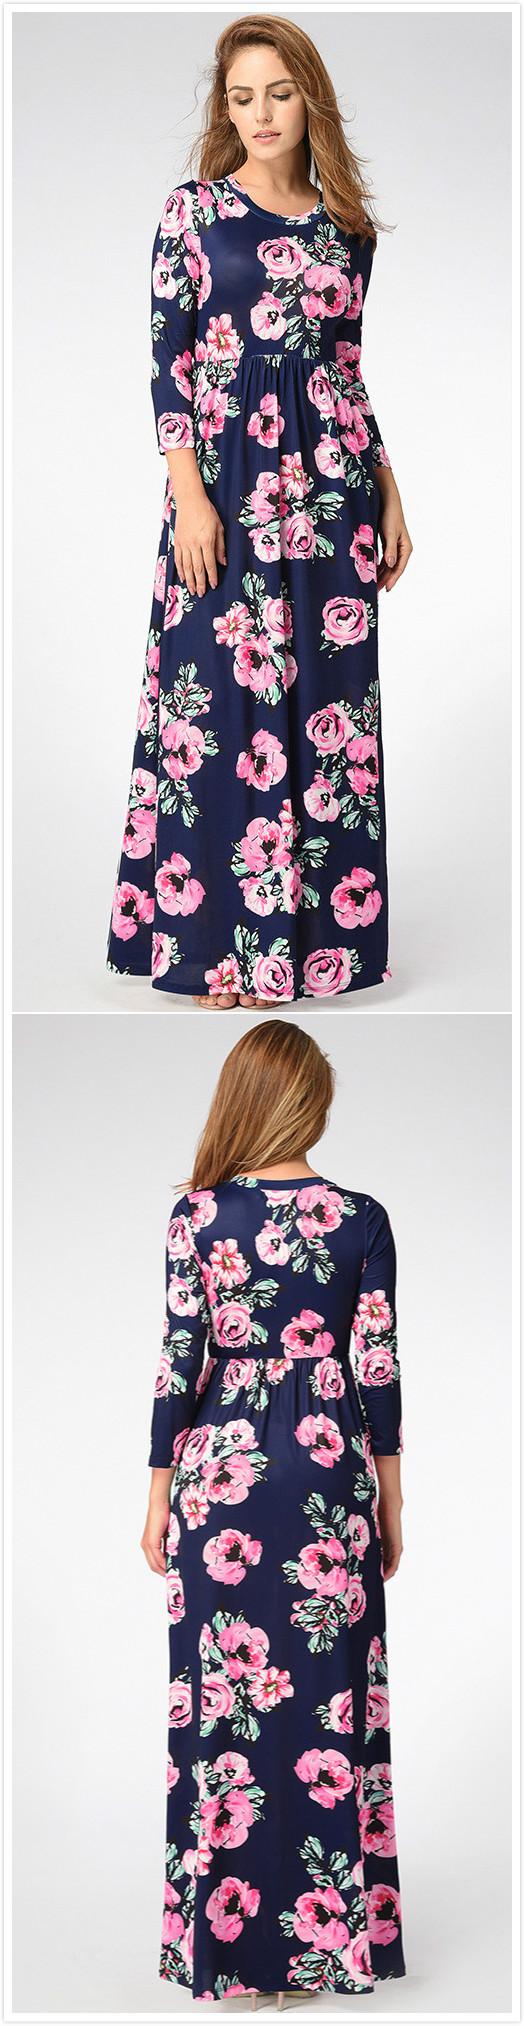 Bohemian long sleeve floral printed maxi prom dress modest fashion